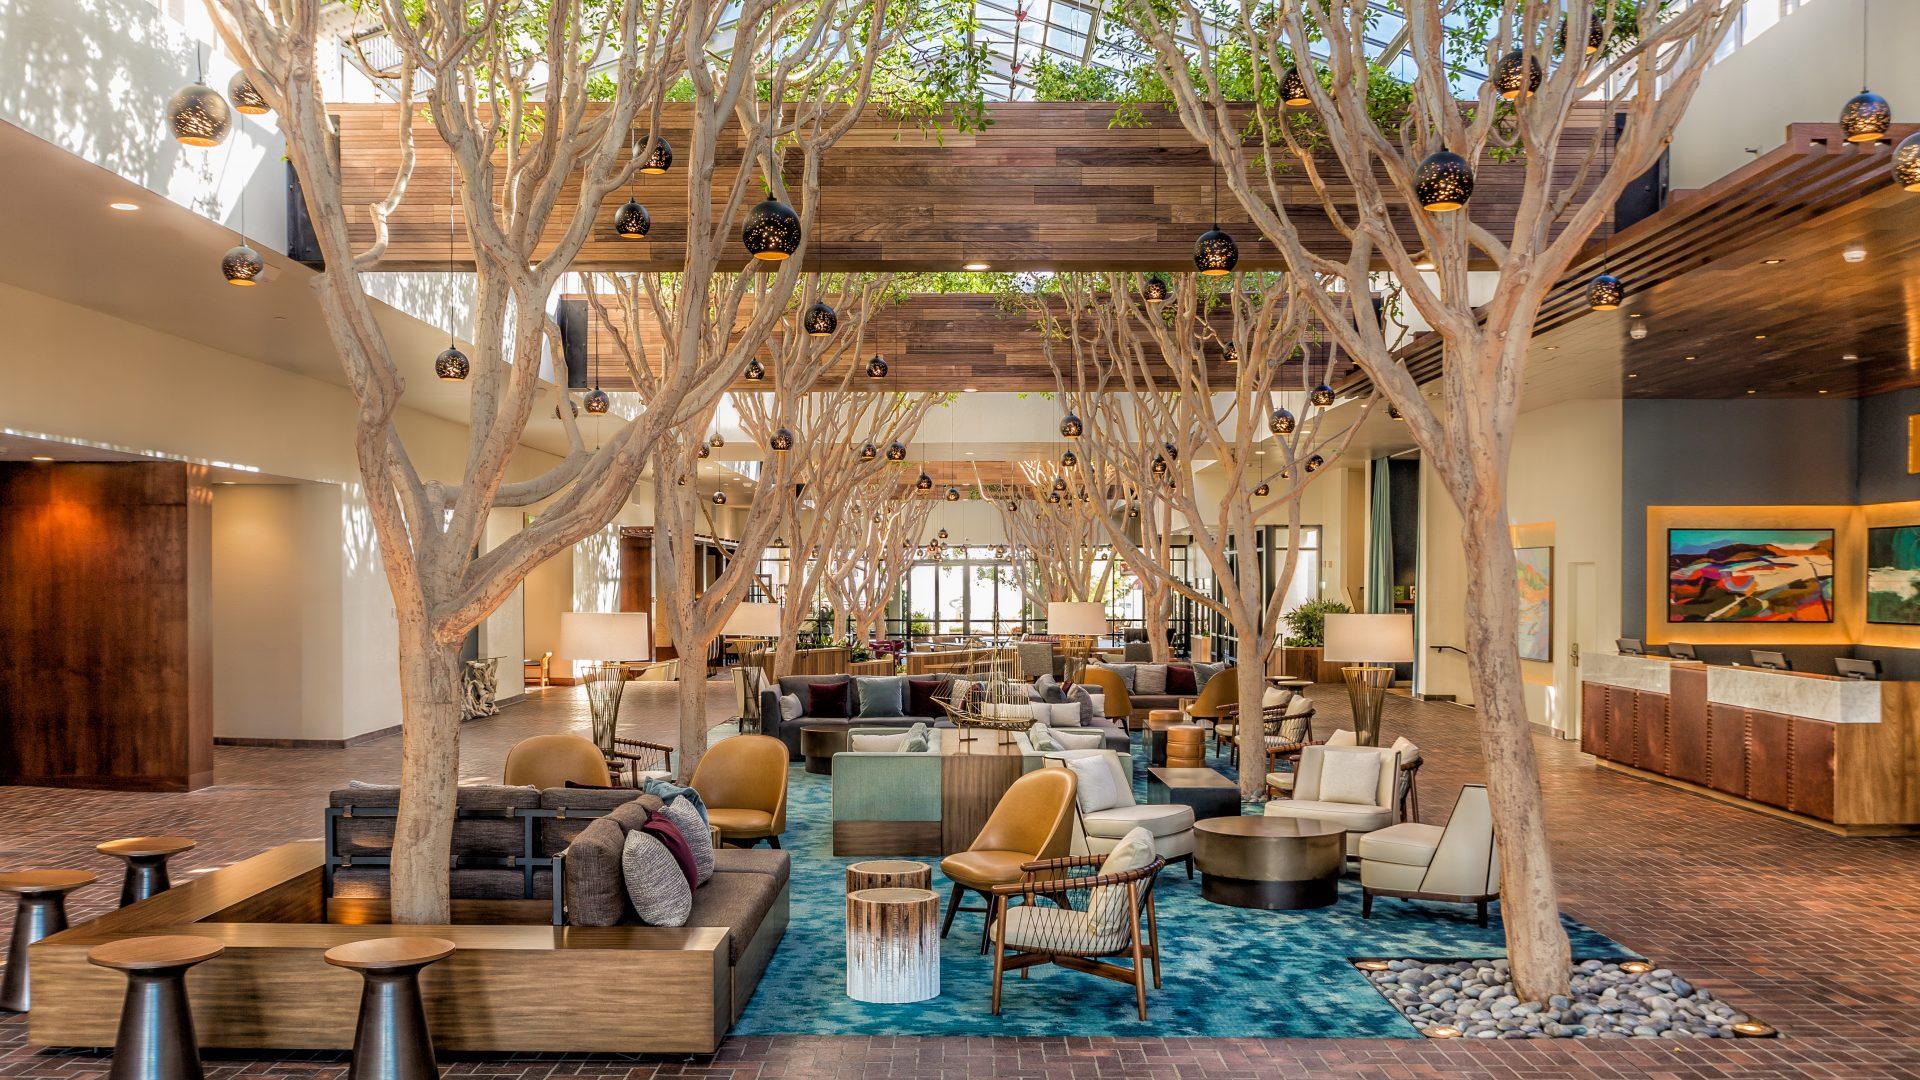 Portola Hotel Amp Spa At Monterey Bay A 4 Diamond Hotel In